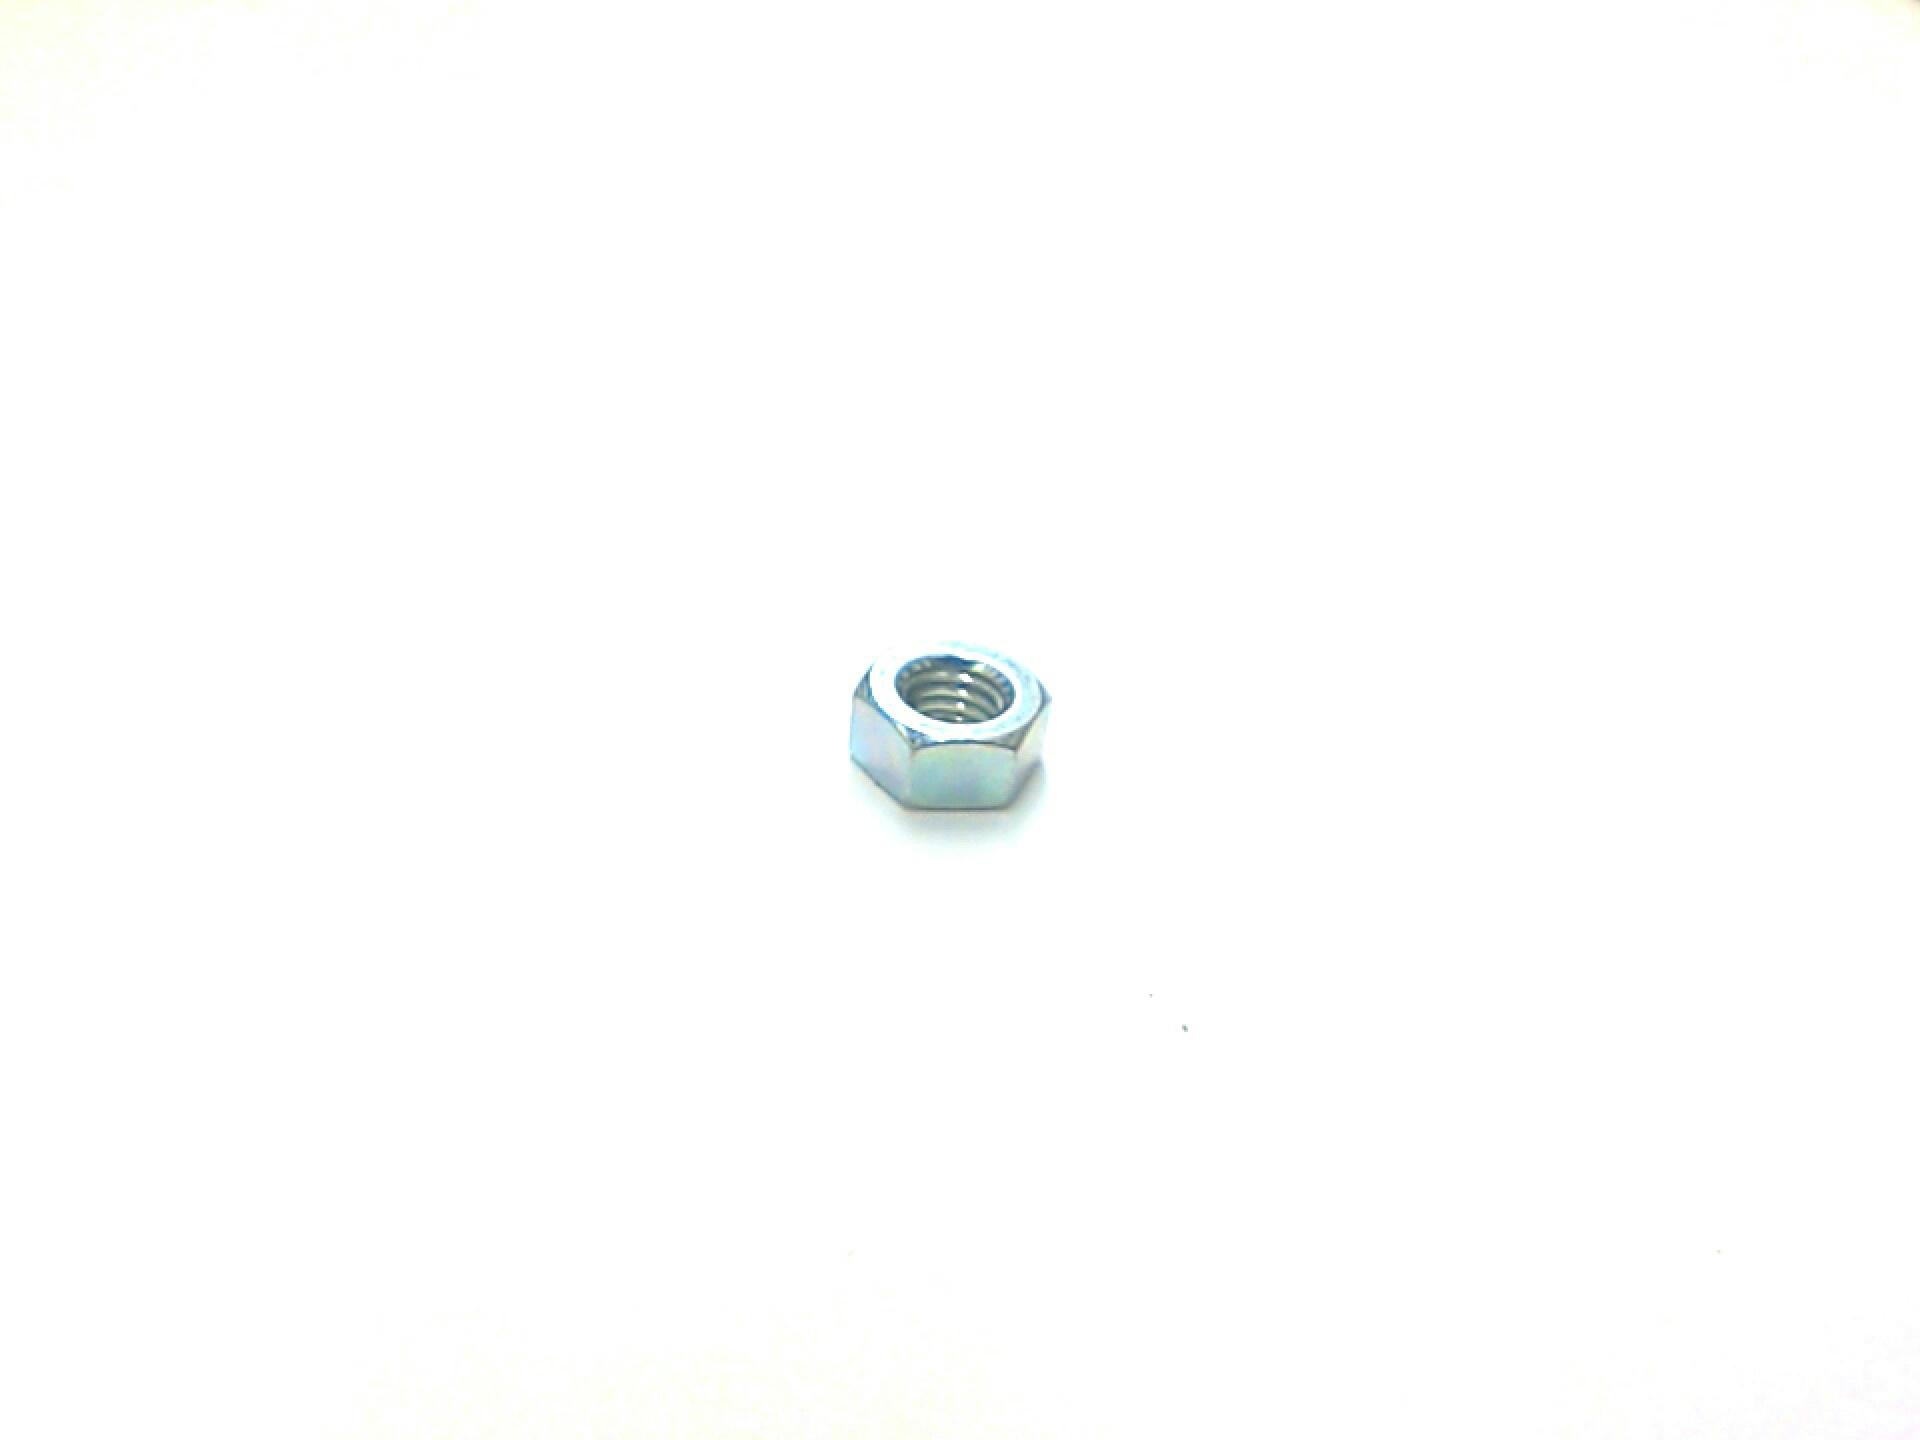 Subaru Forester Fuse Box Nut  Fuse Box Mounting Nut